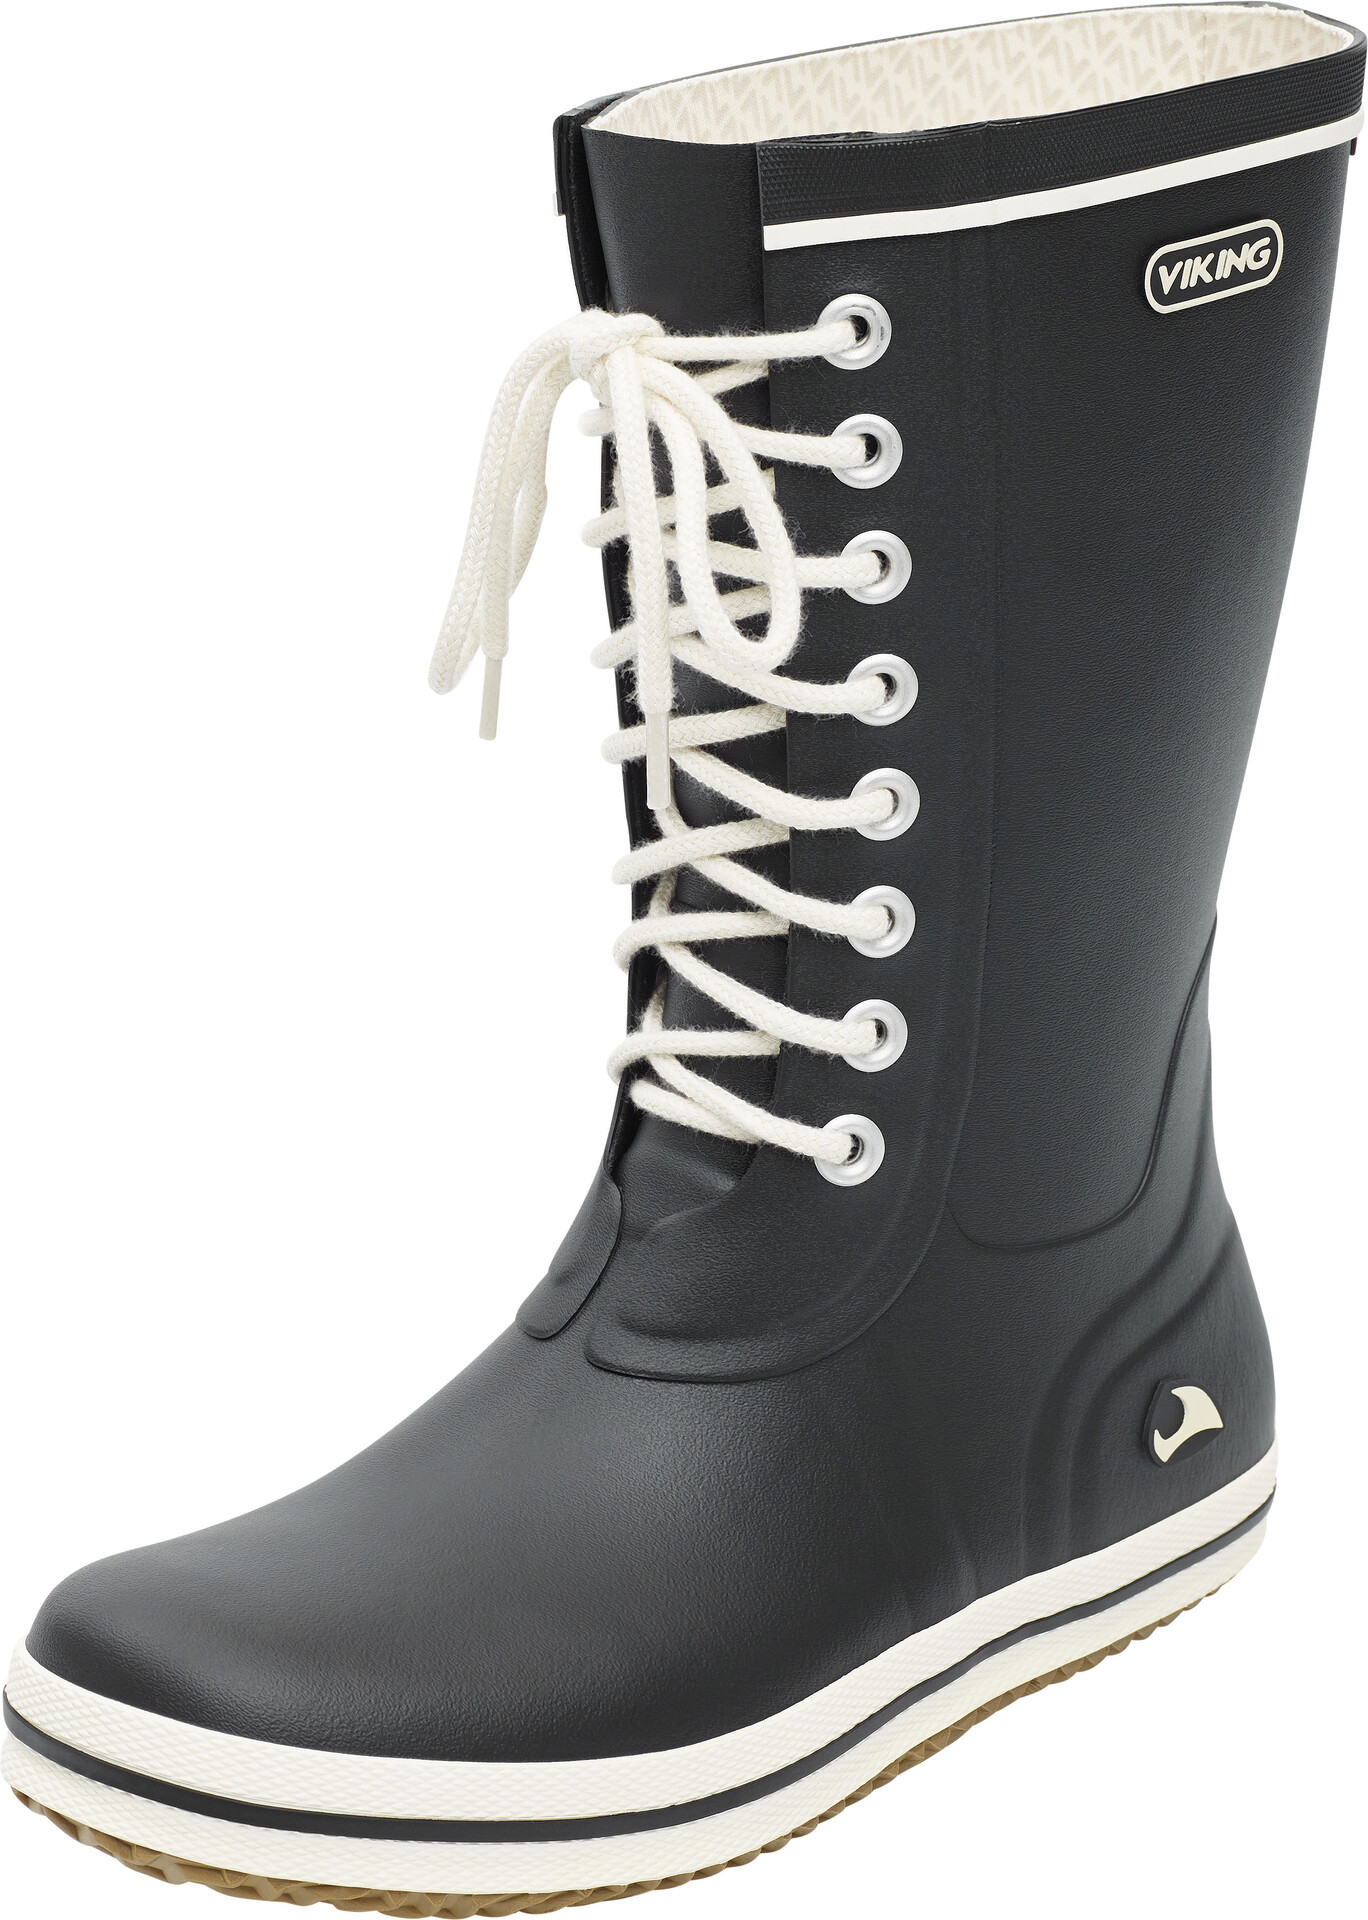 3dcb2e2c7 Agua es Negro De Footwear Campz Botas Retro Mujer Viking Light wqzHXBO